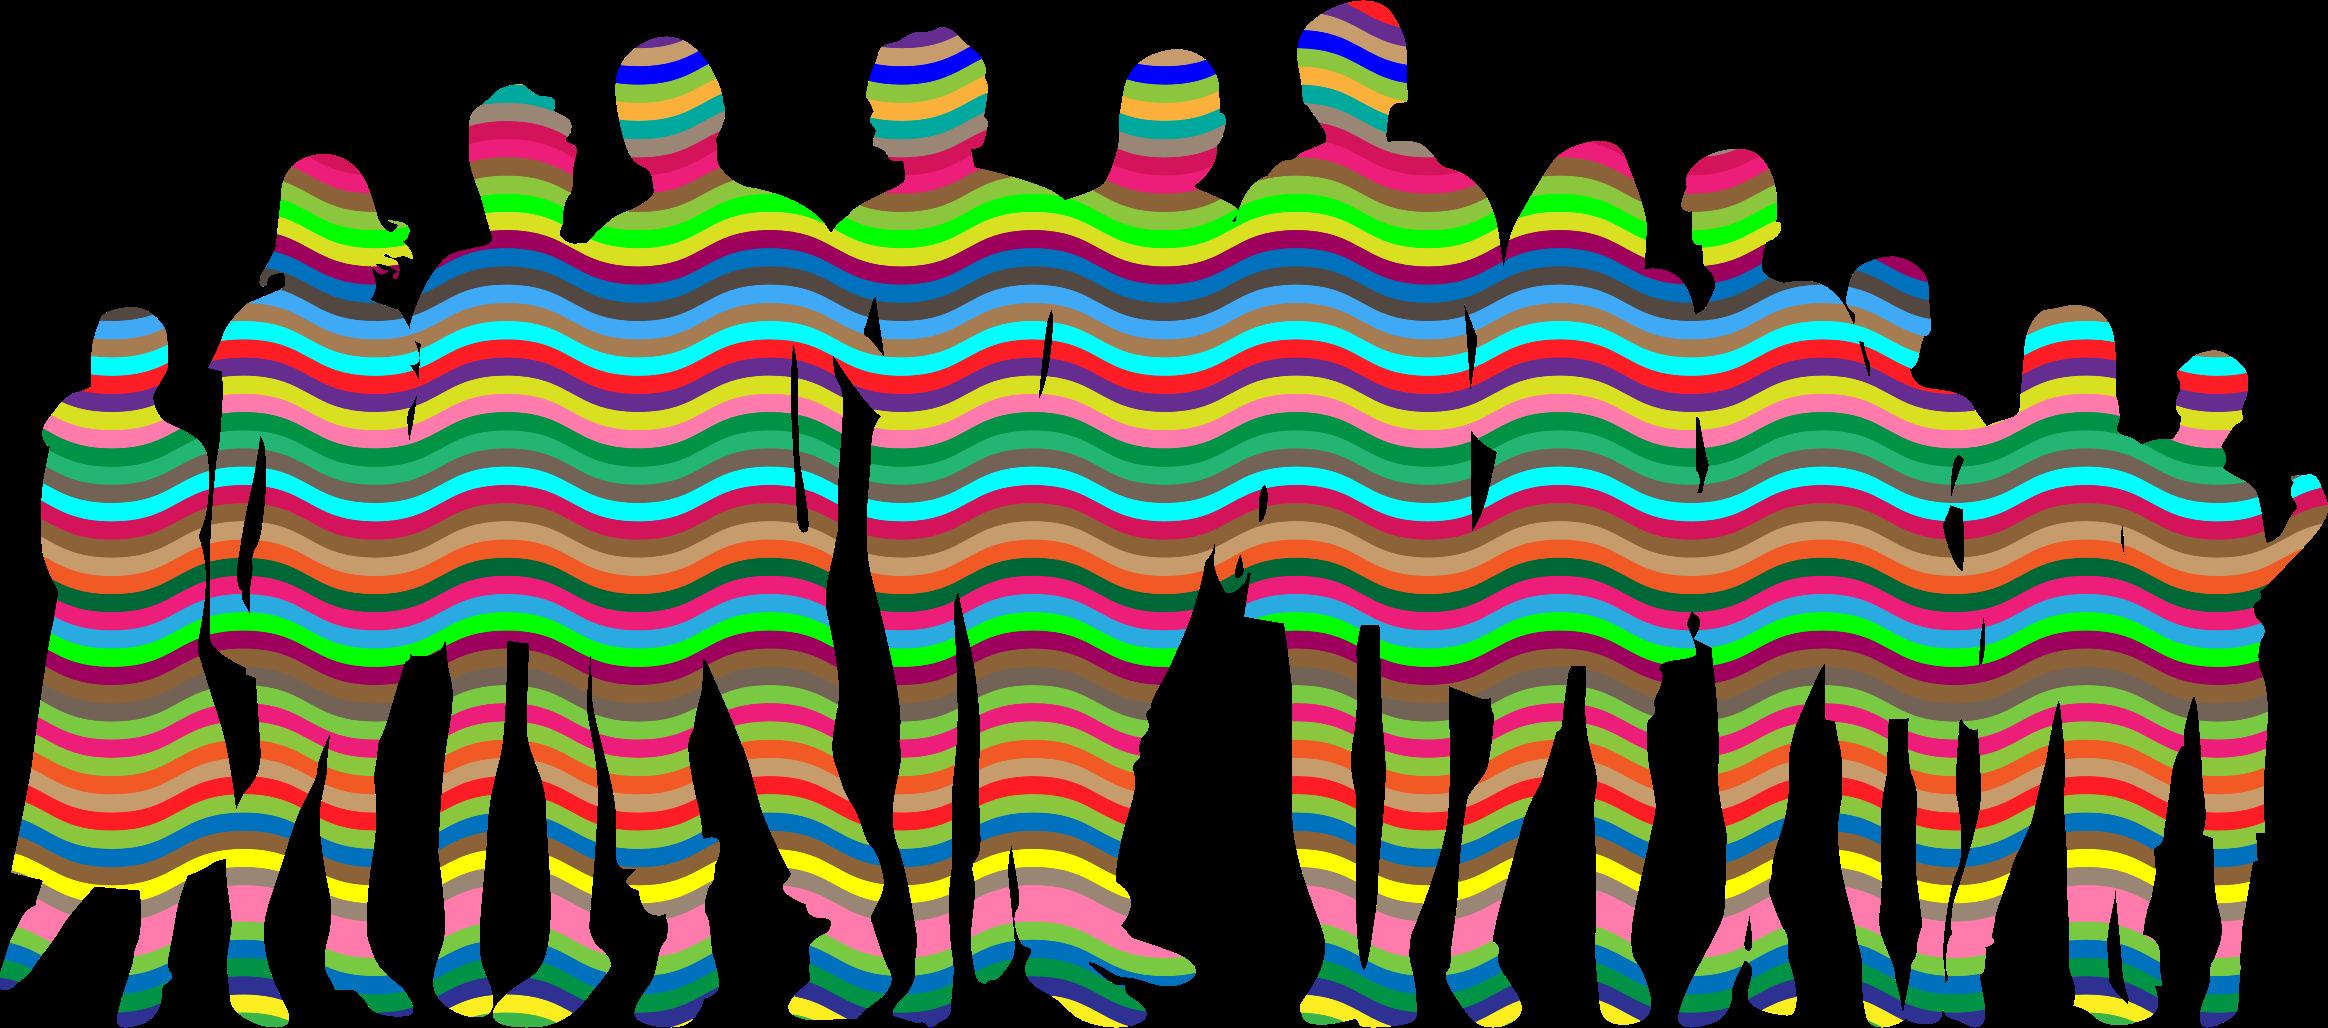 Human clipart human family. Prismatic waves big image